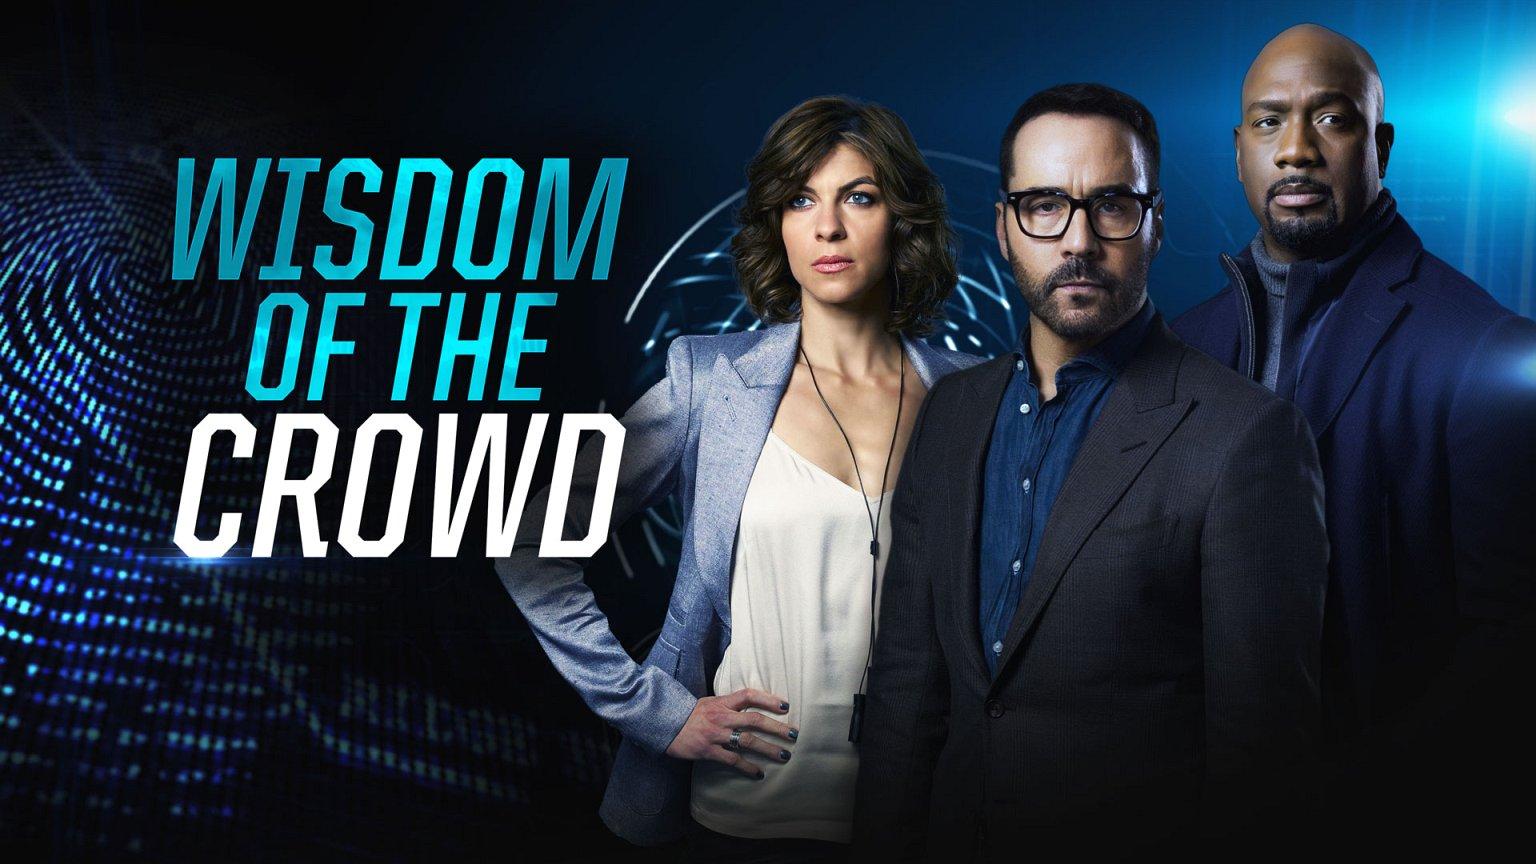 Wisdom of the Crowd season 1 episode 10 watch online